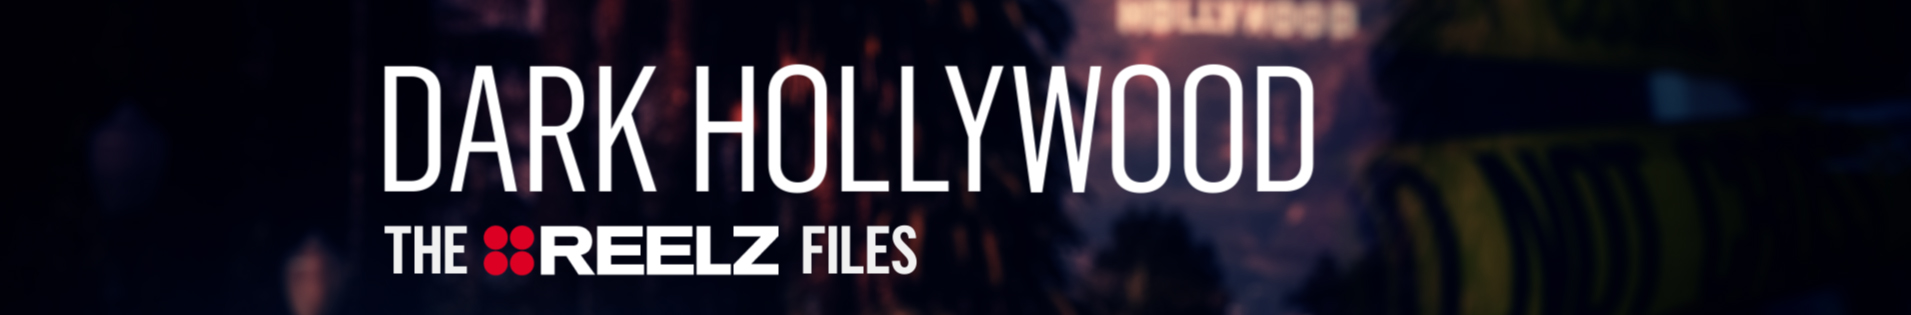 Dark Hollywood: The Reelz Files